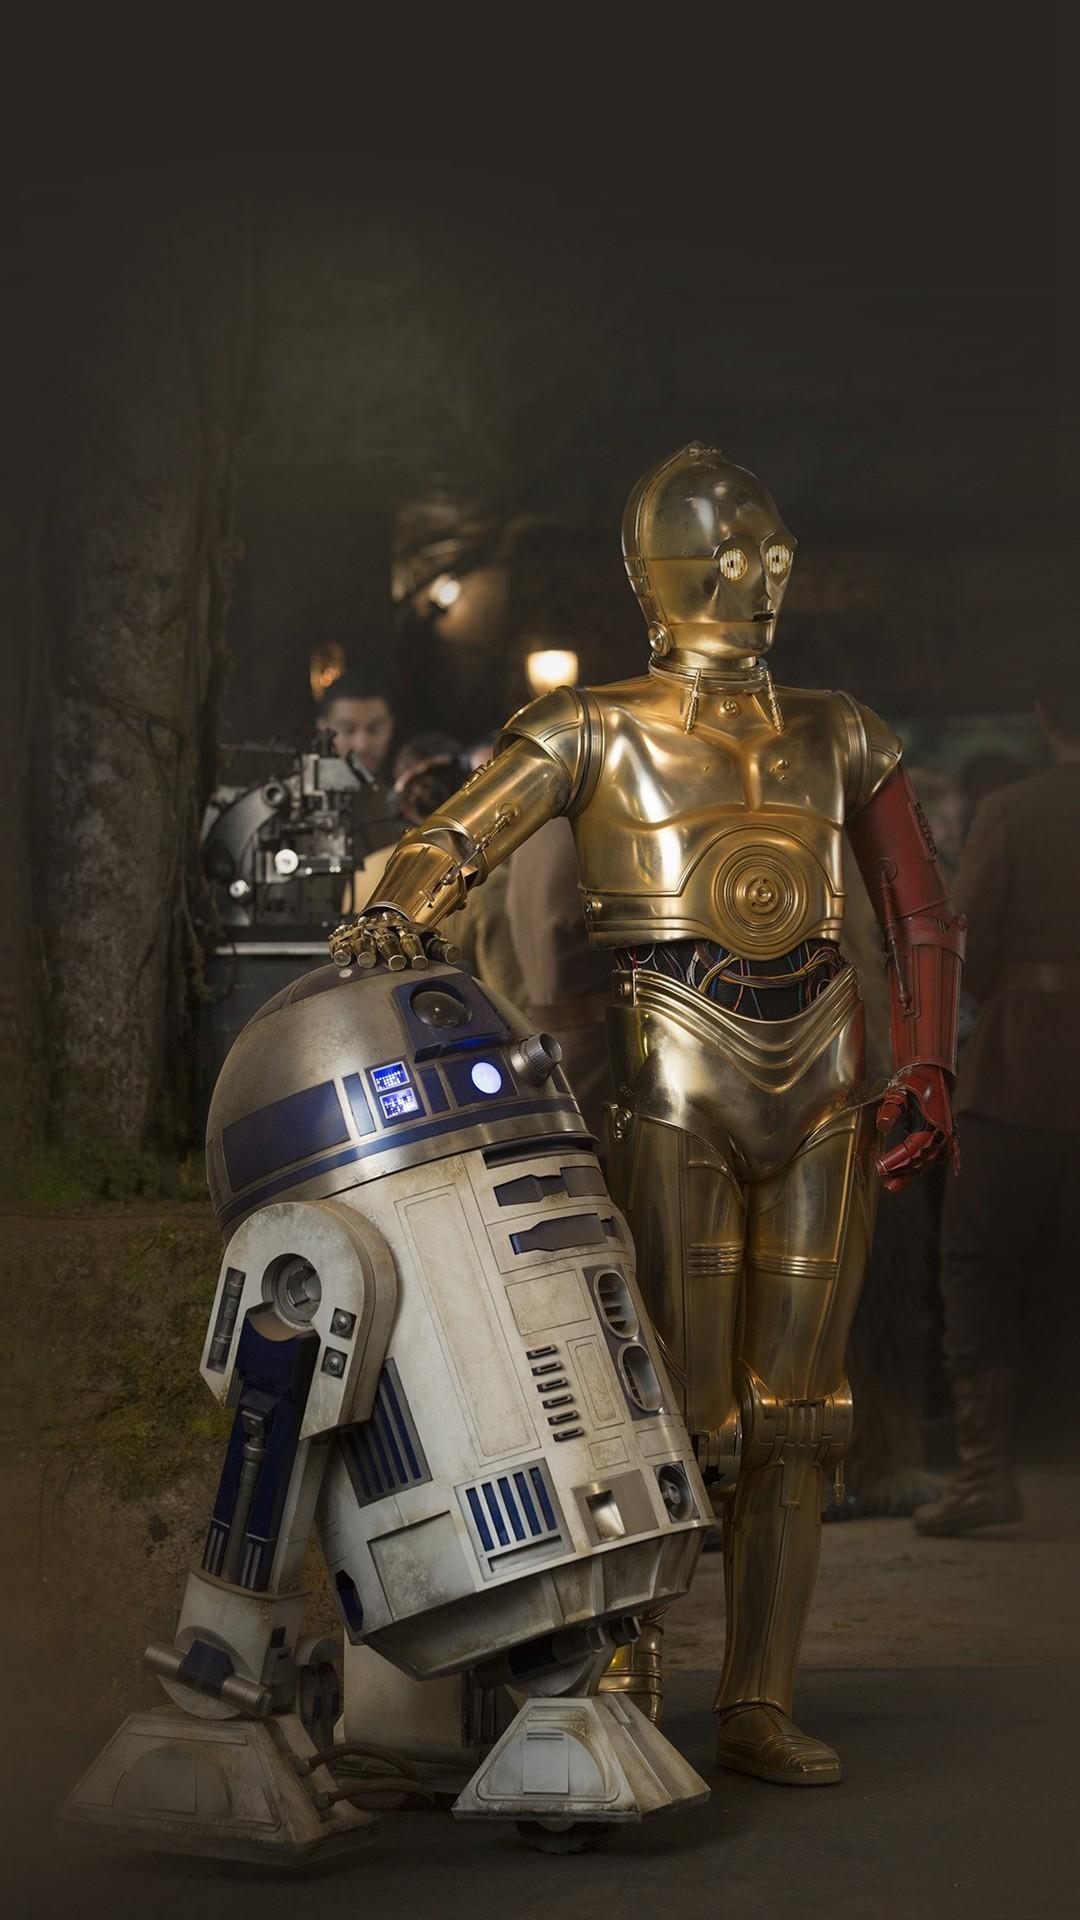 Starwars R2 D2 Robot Film Art iPhone 8 wallpaper